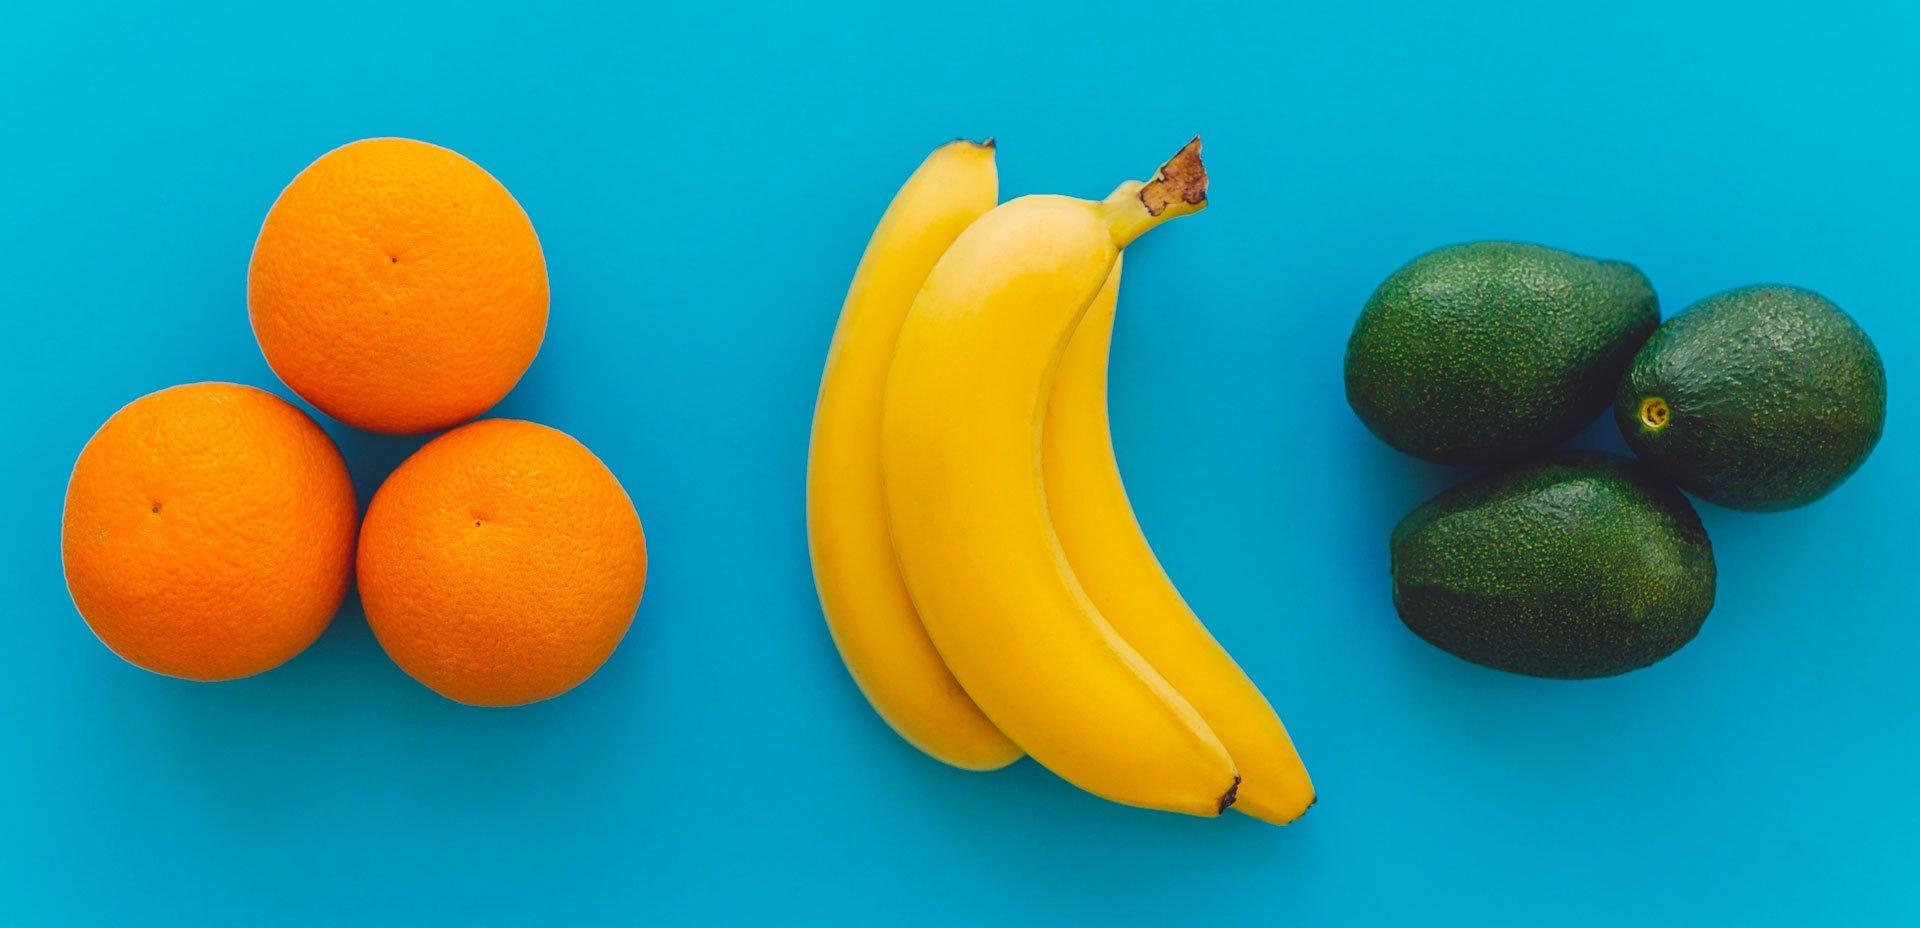 arance, banane, avocado per buon umore